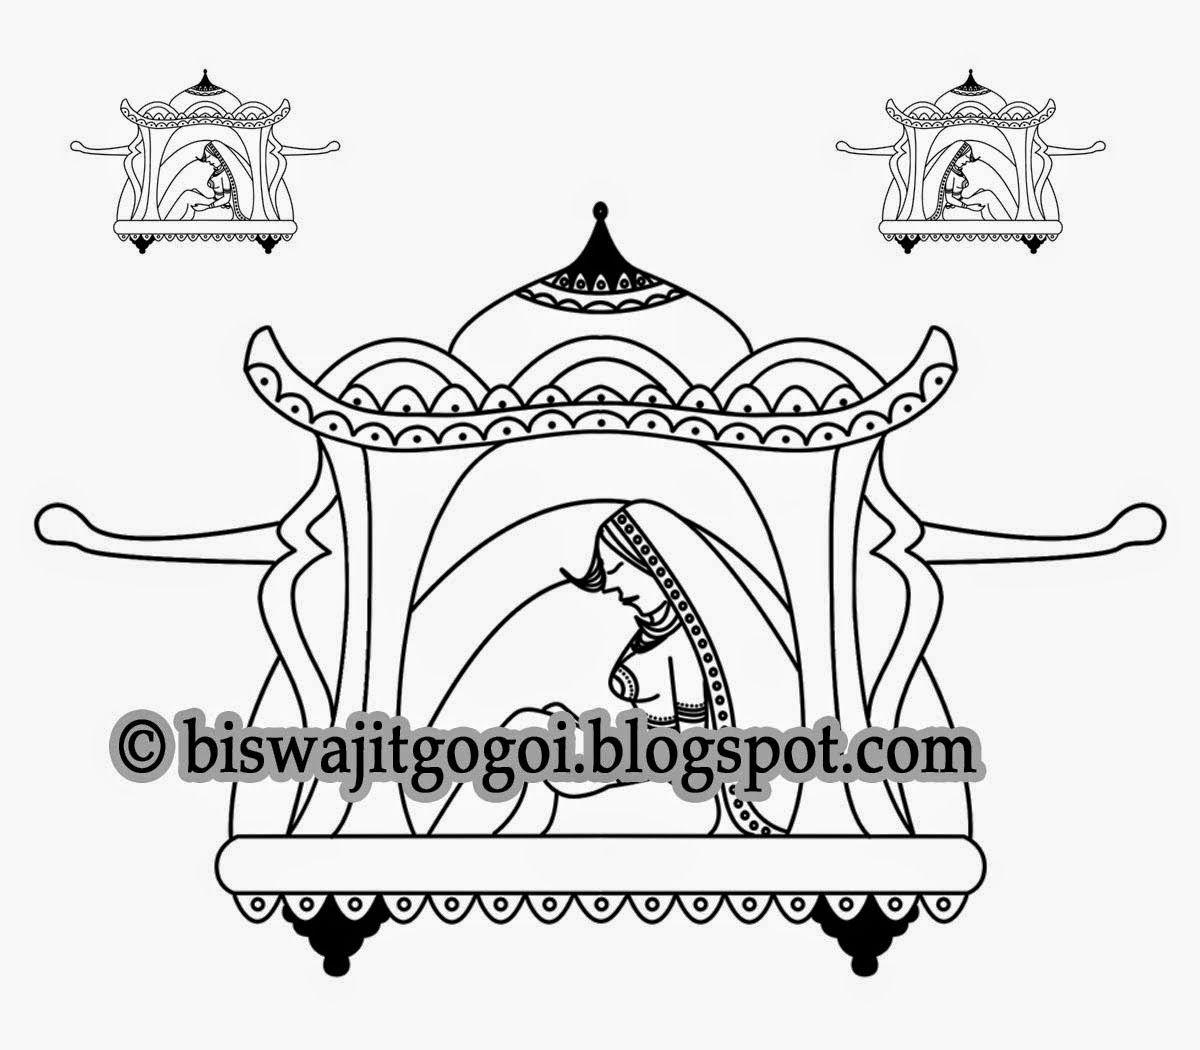 indian wedding clipart indian wedding symbol hindu wedding symbol [ 1200 x 1050 Pixel ]